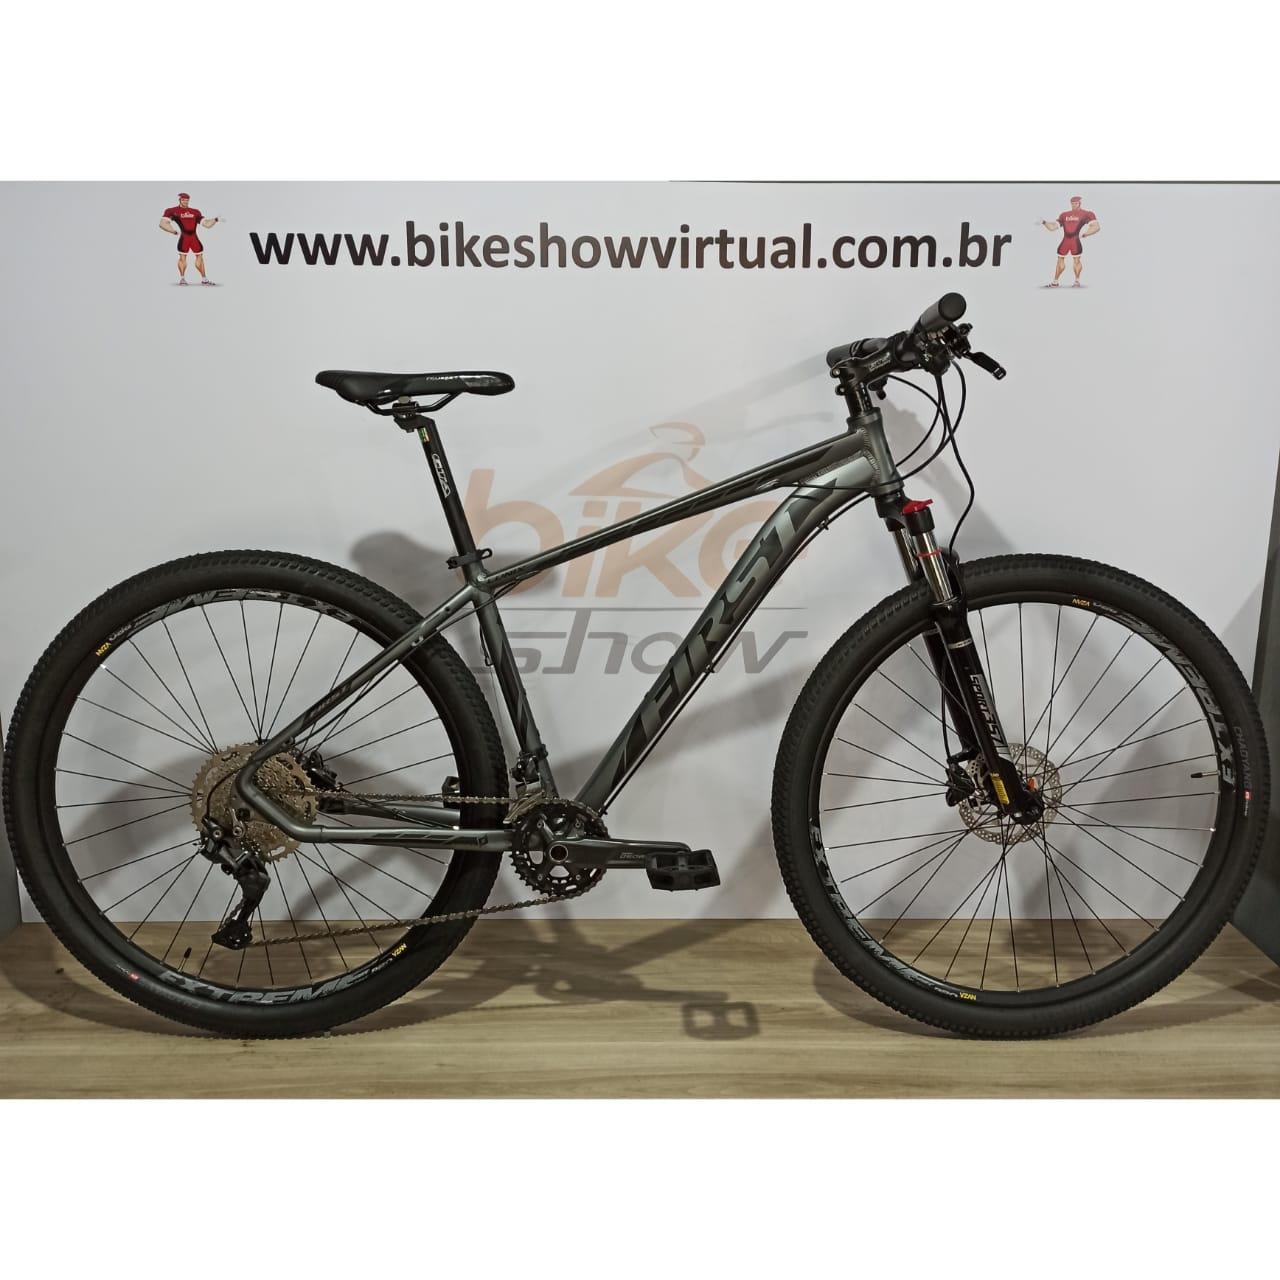 Bicicleta FIRST Lunix aro 29 - 20v Shimano Deore k7 11/46 dentes - Freio Shimano Hidráulico - Suspensão GTA c/ trava no ombro